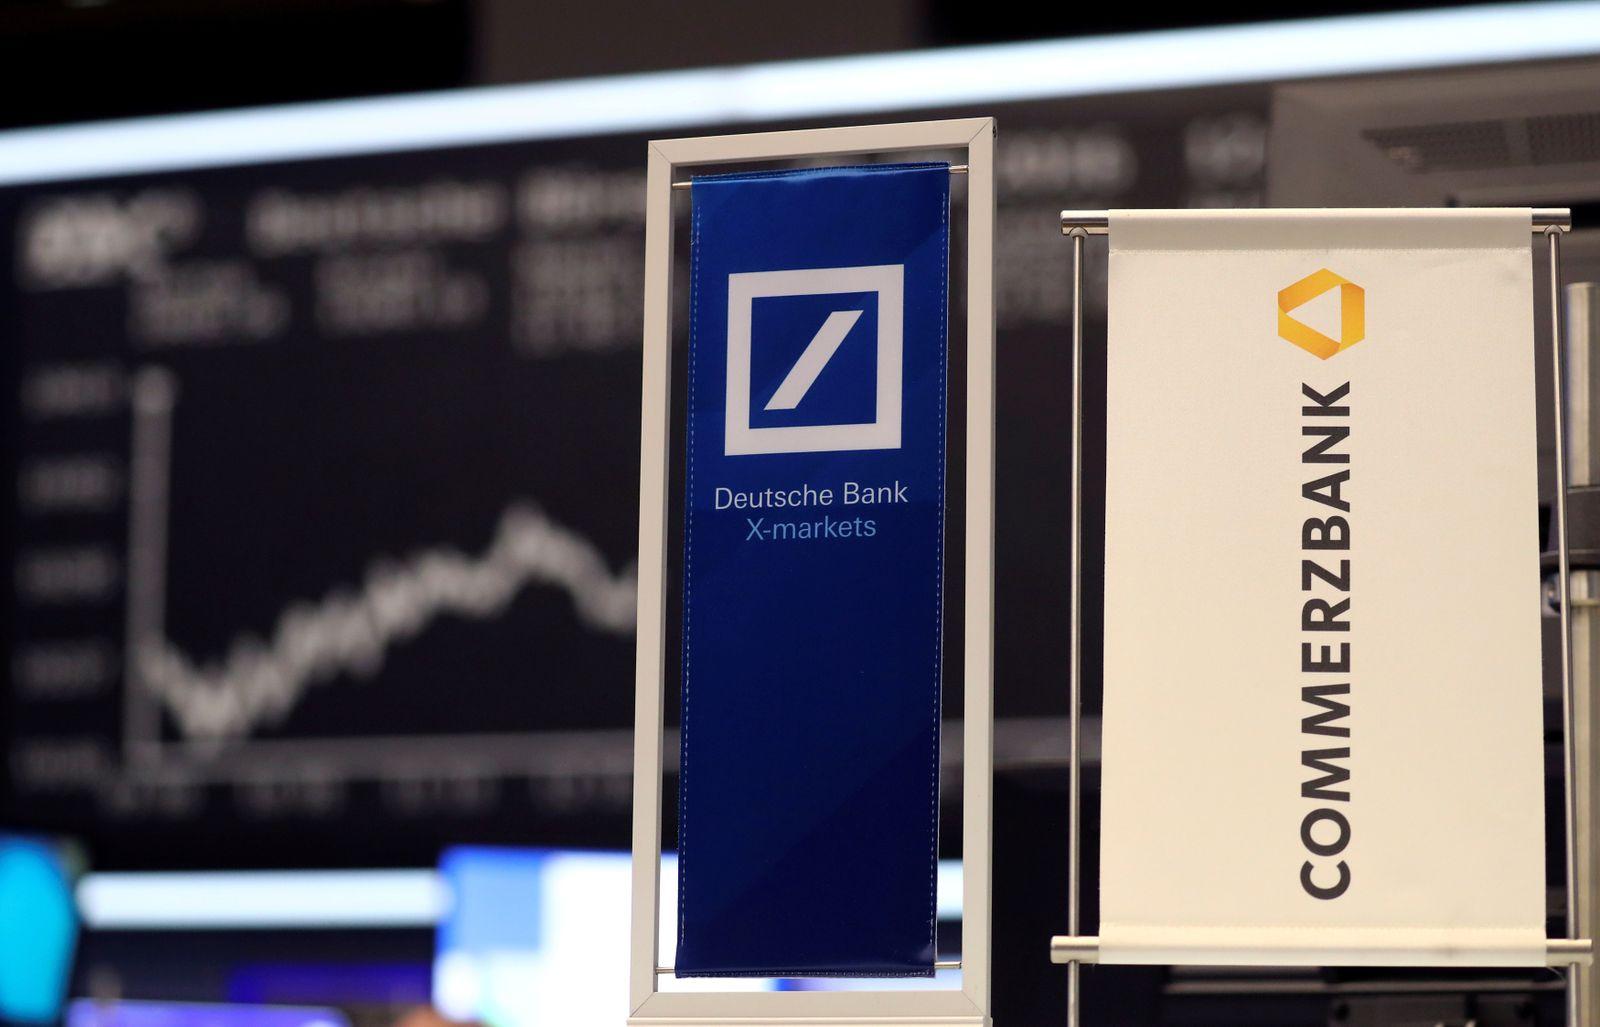 Deutsche Bank / Commerzbank / Börse